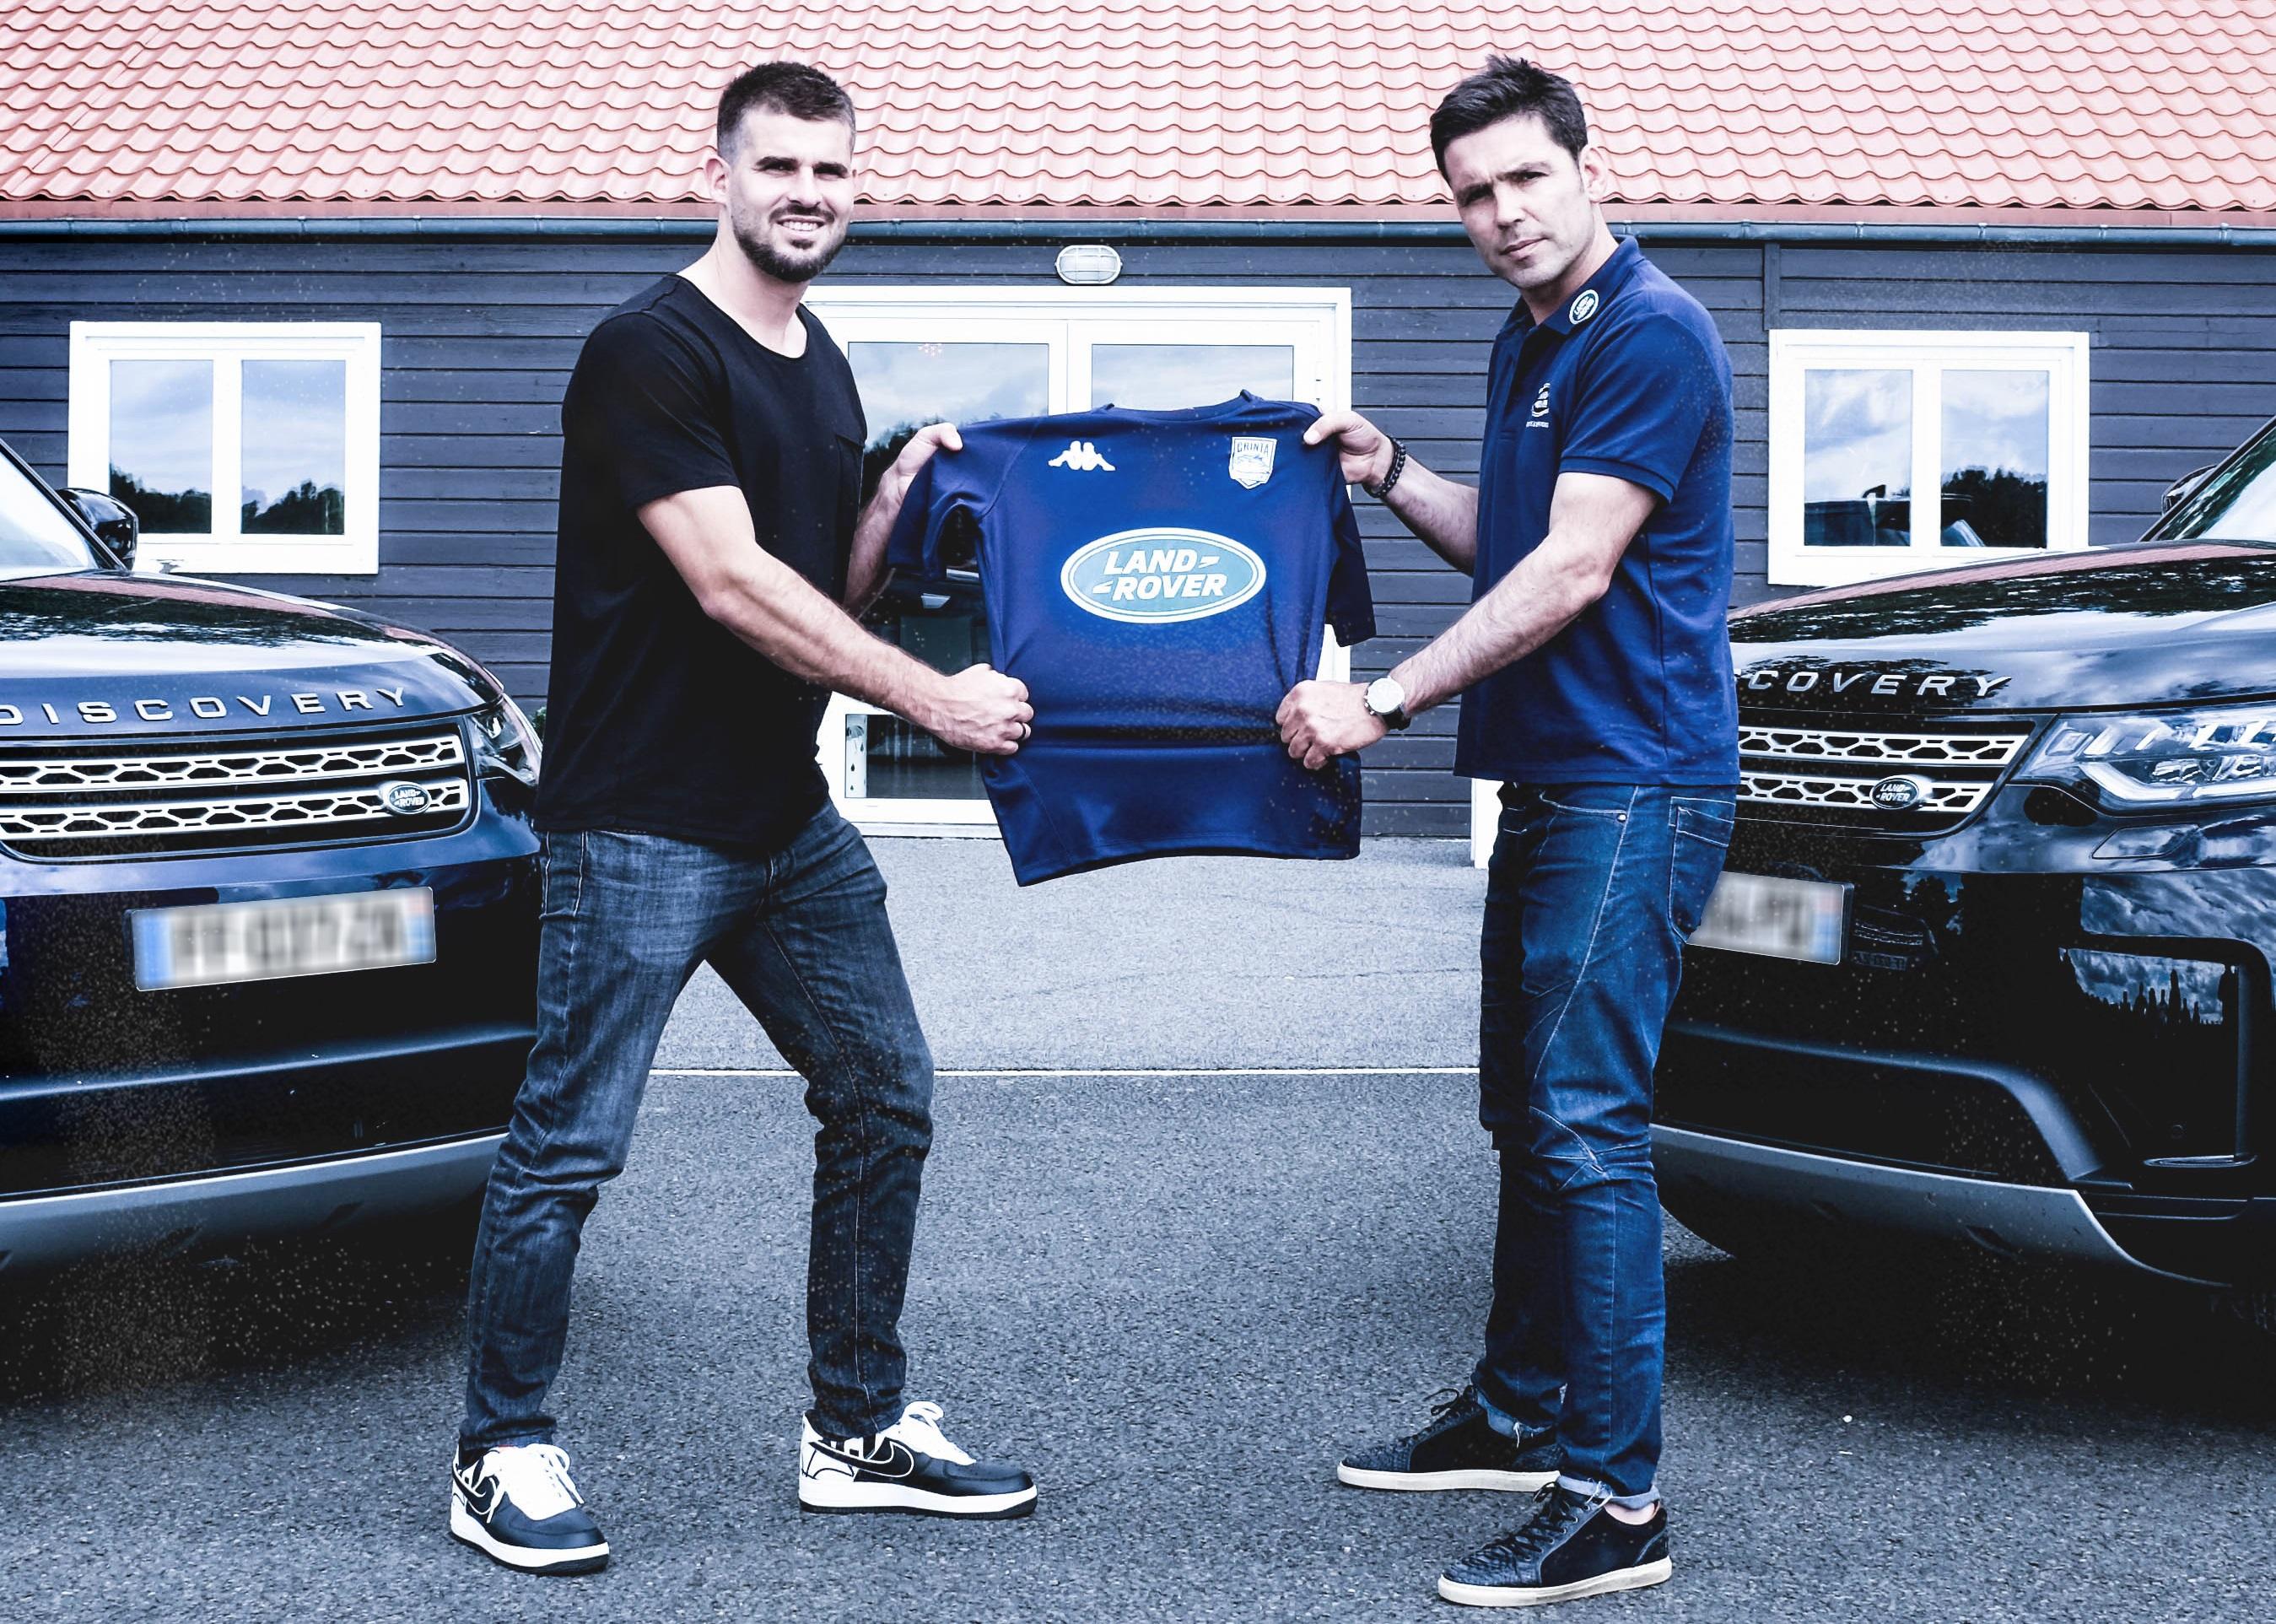 Dimitri-Yachvili-et-Hugi-Bonneval-Land-Rover-sponsoring-rugby-amateur1